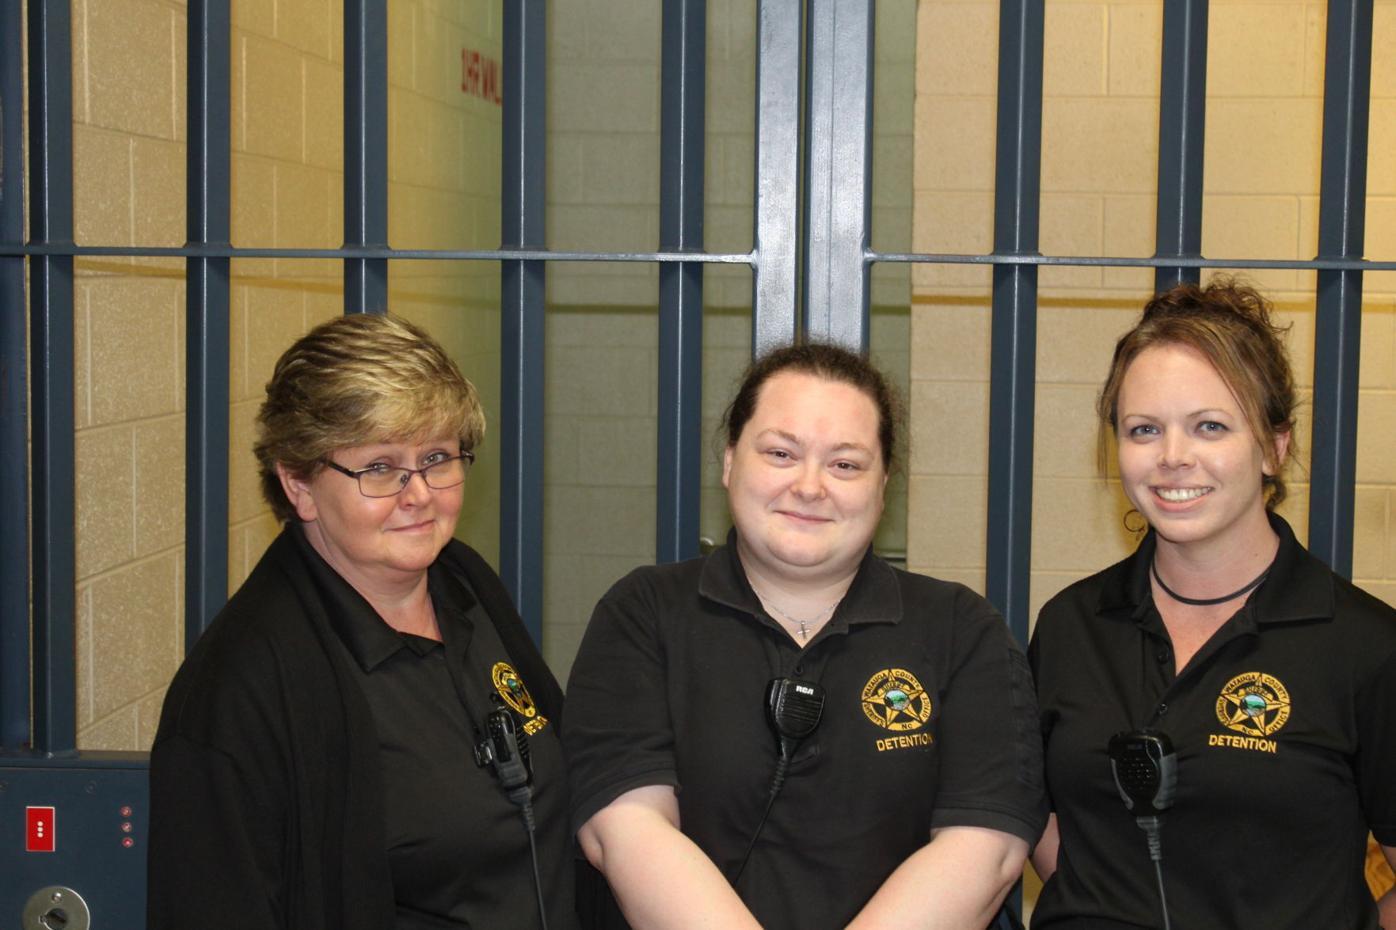 Watuaga Detention Center staff